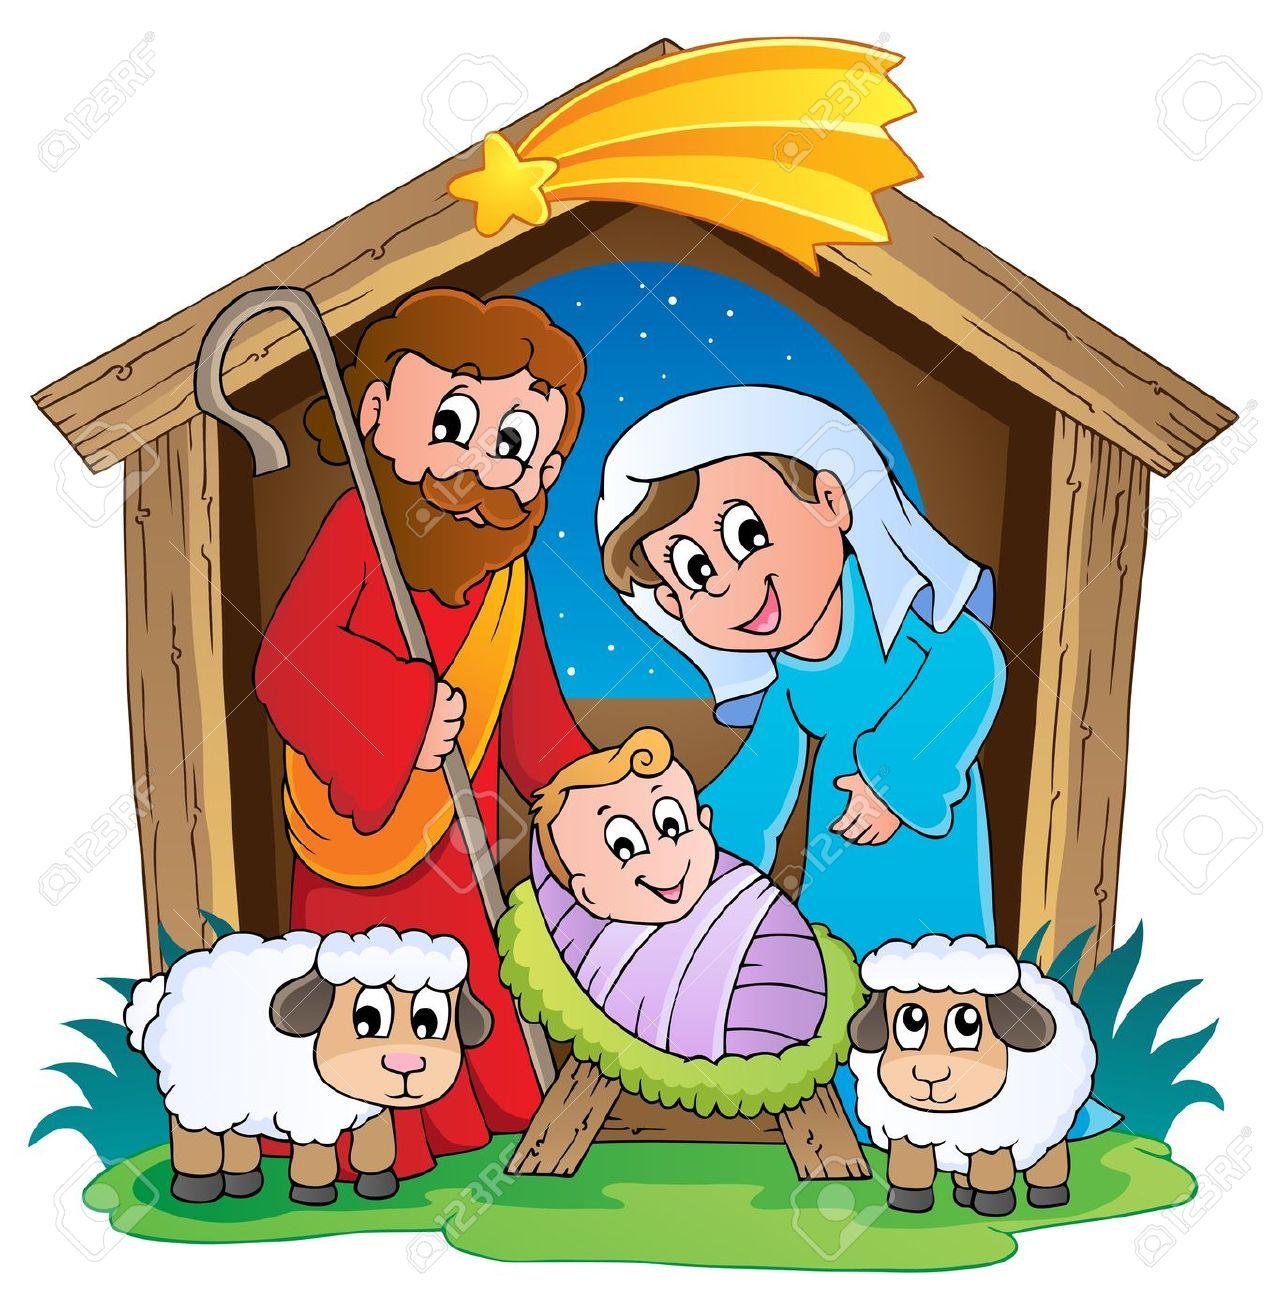 Clip Art of the Nativity.